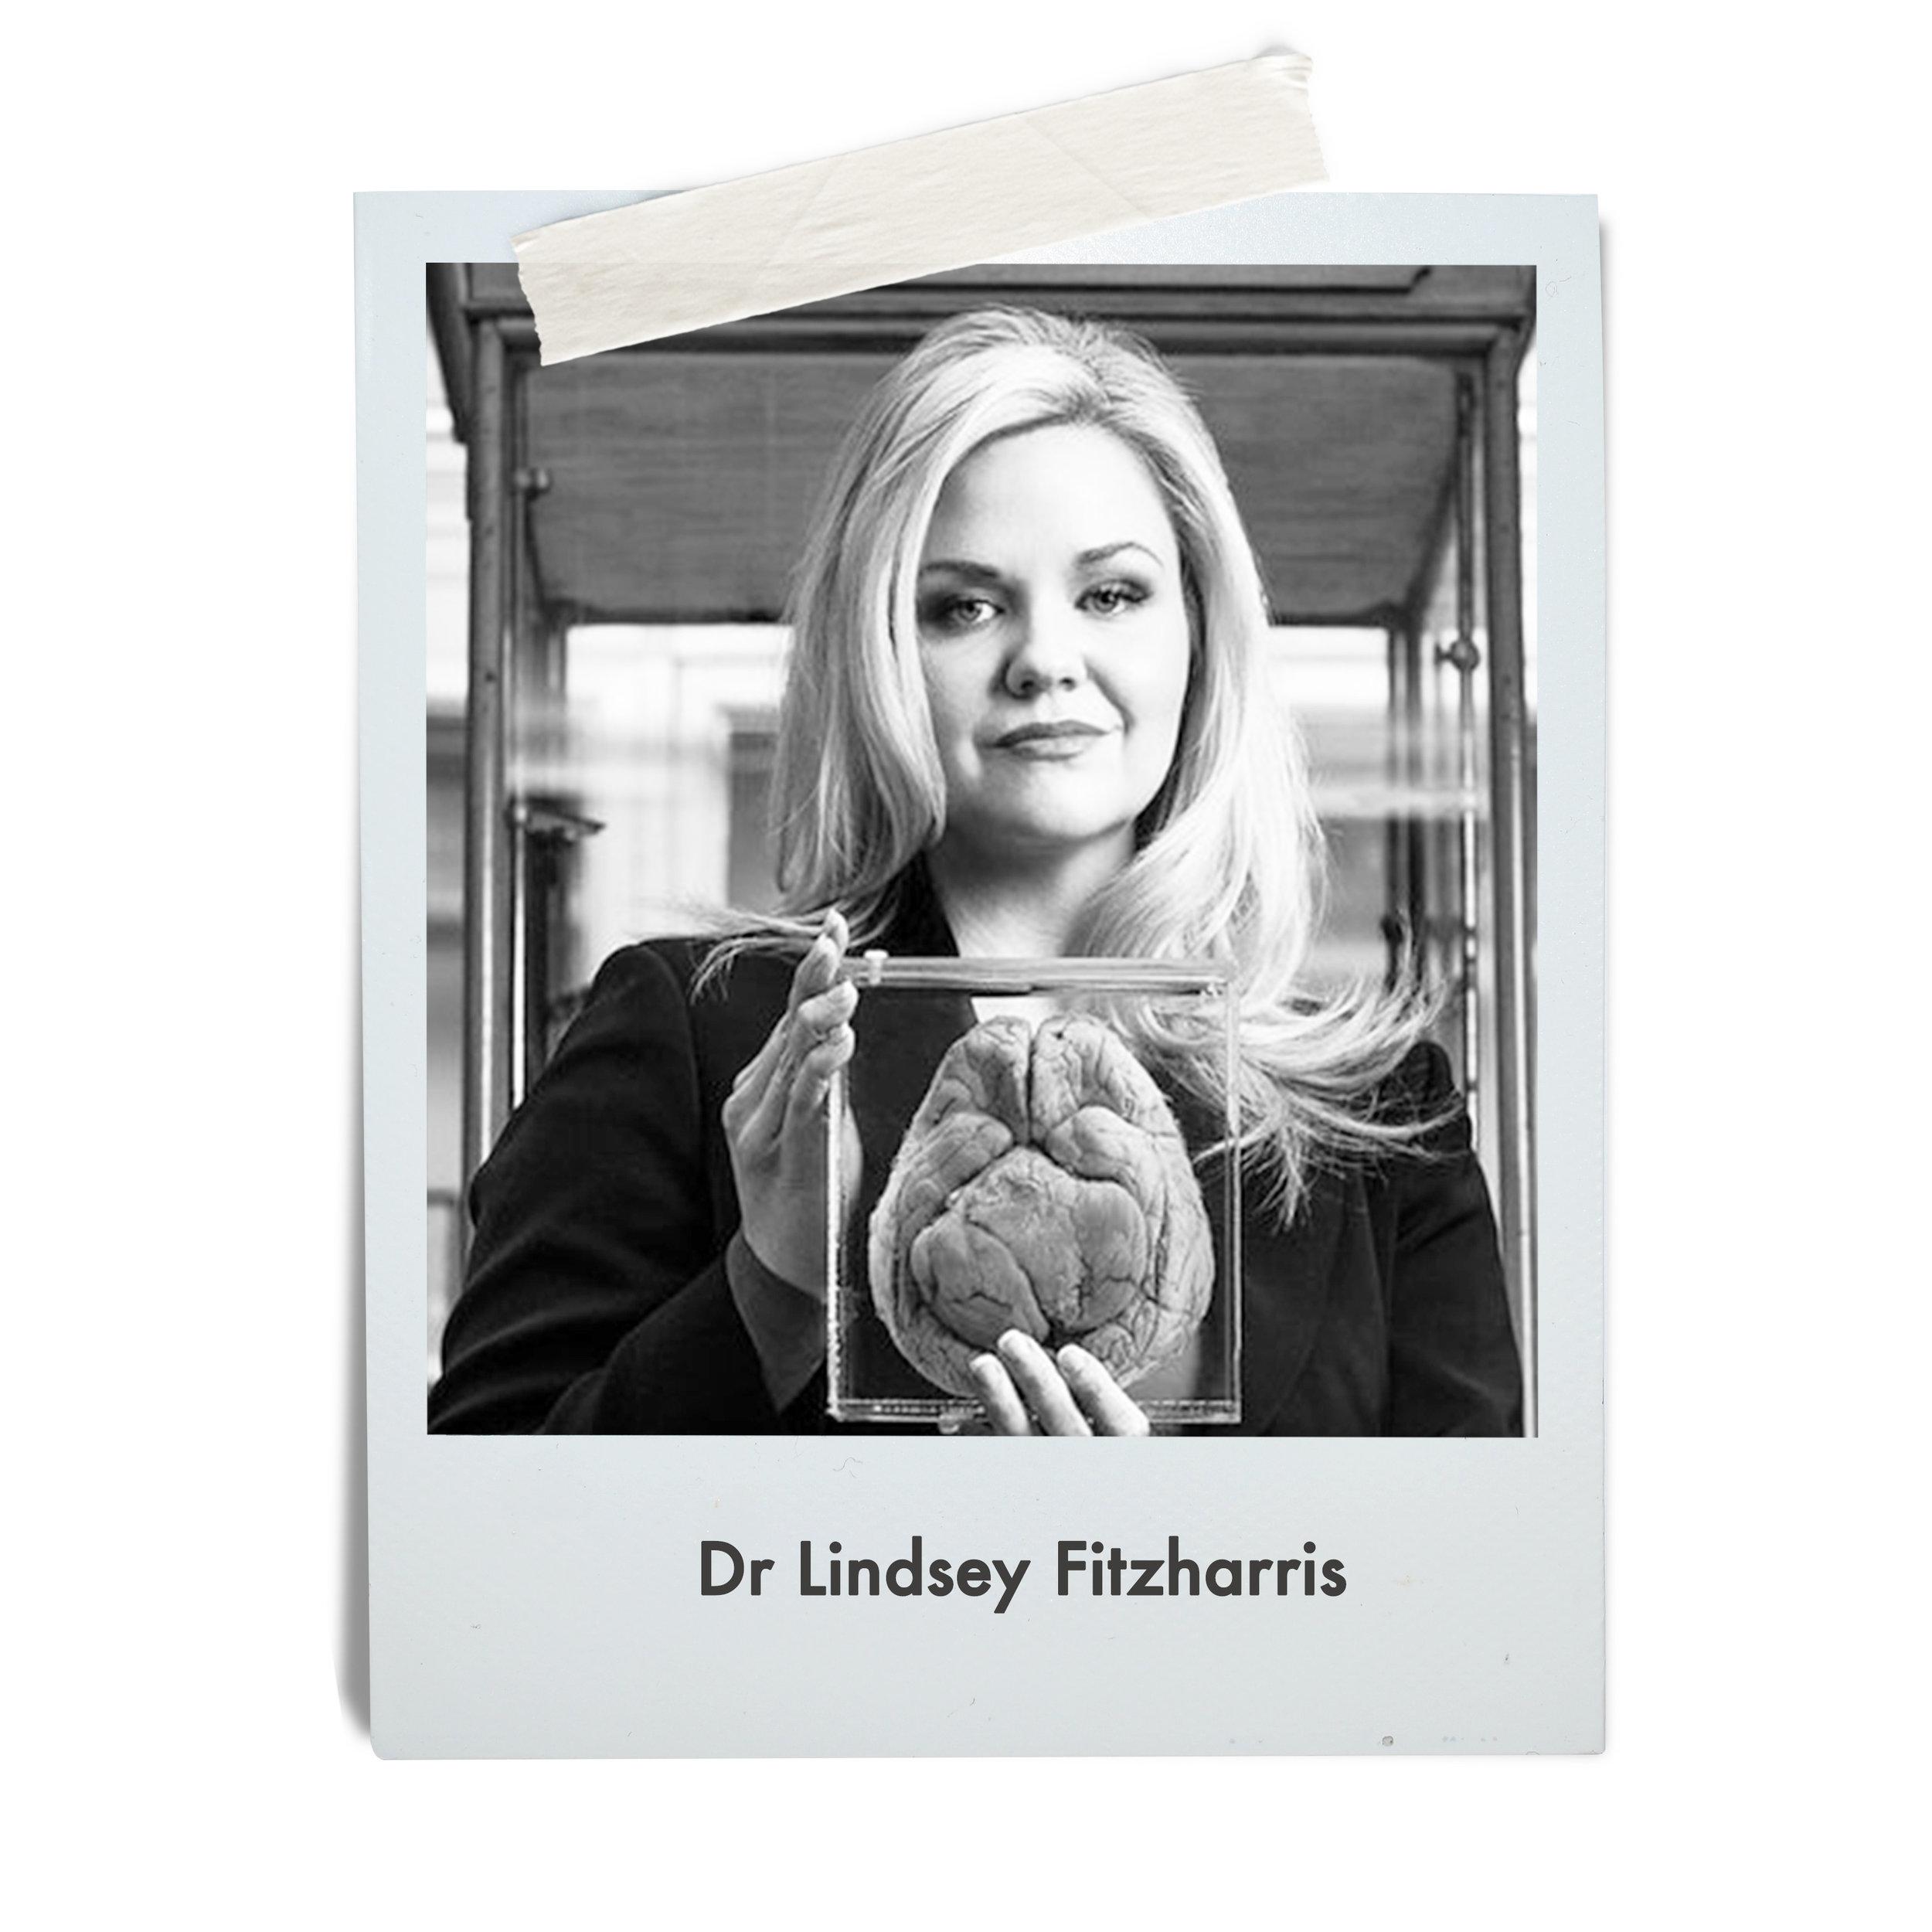 Dr Lindsey Fitzharris